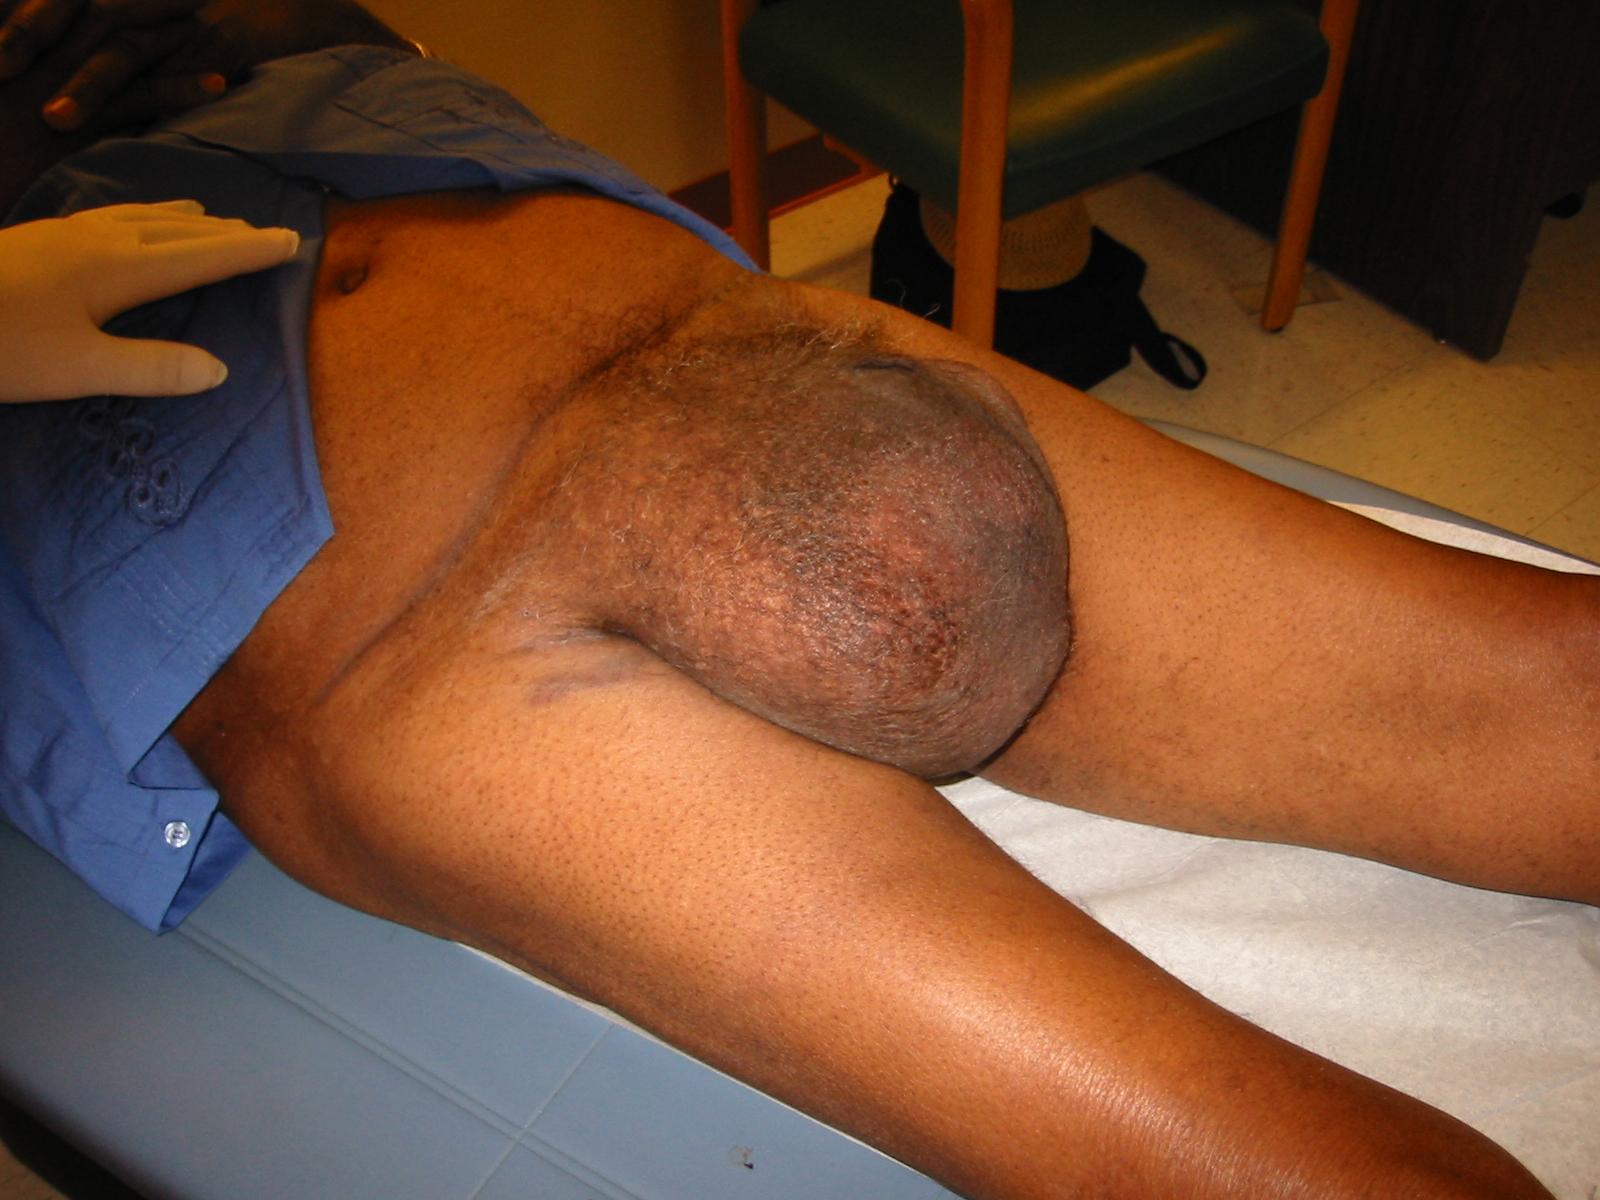 Large Scrotal Inguinal Hernia